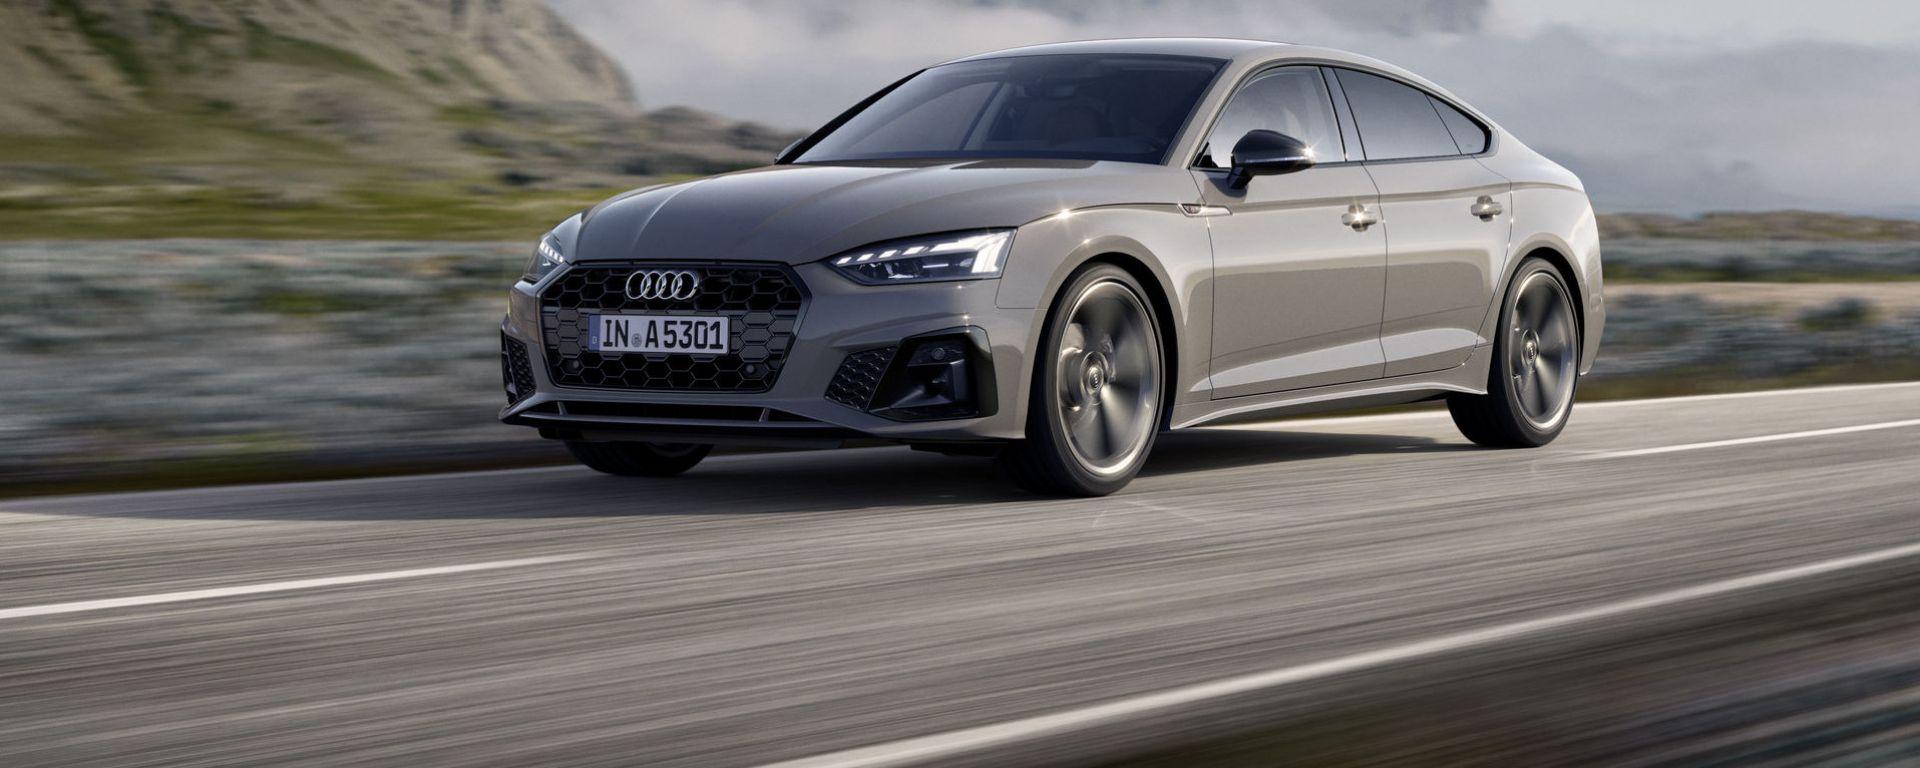 Audi A5 Sportback 2020: vista 3/4 anteriore